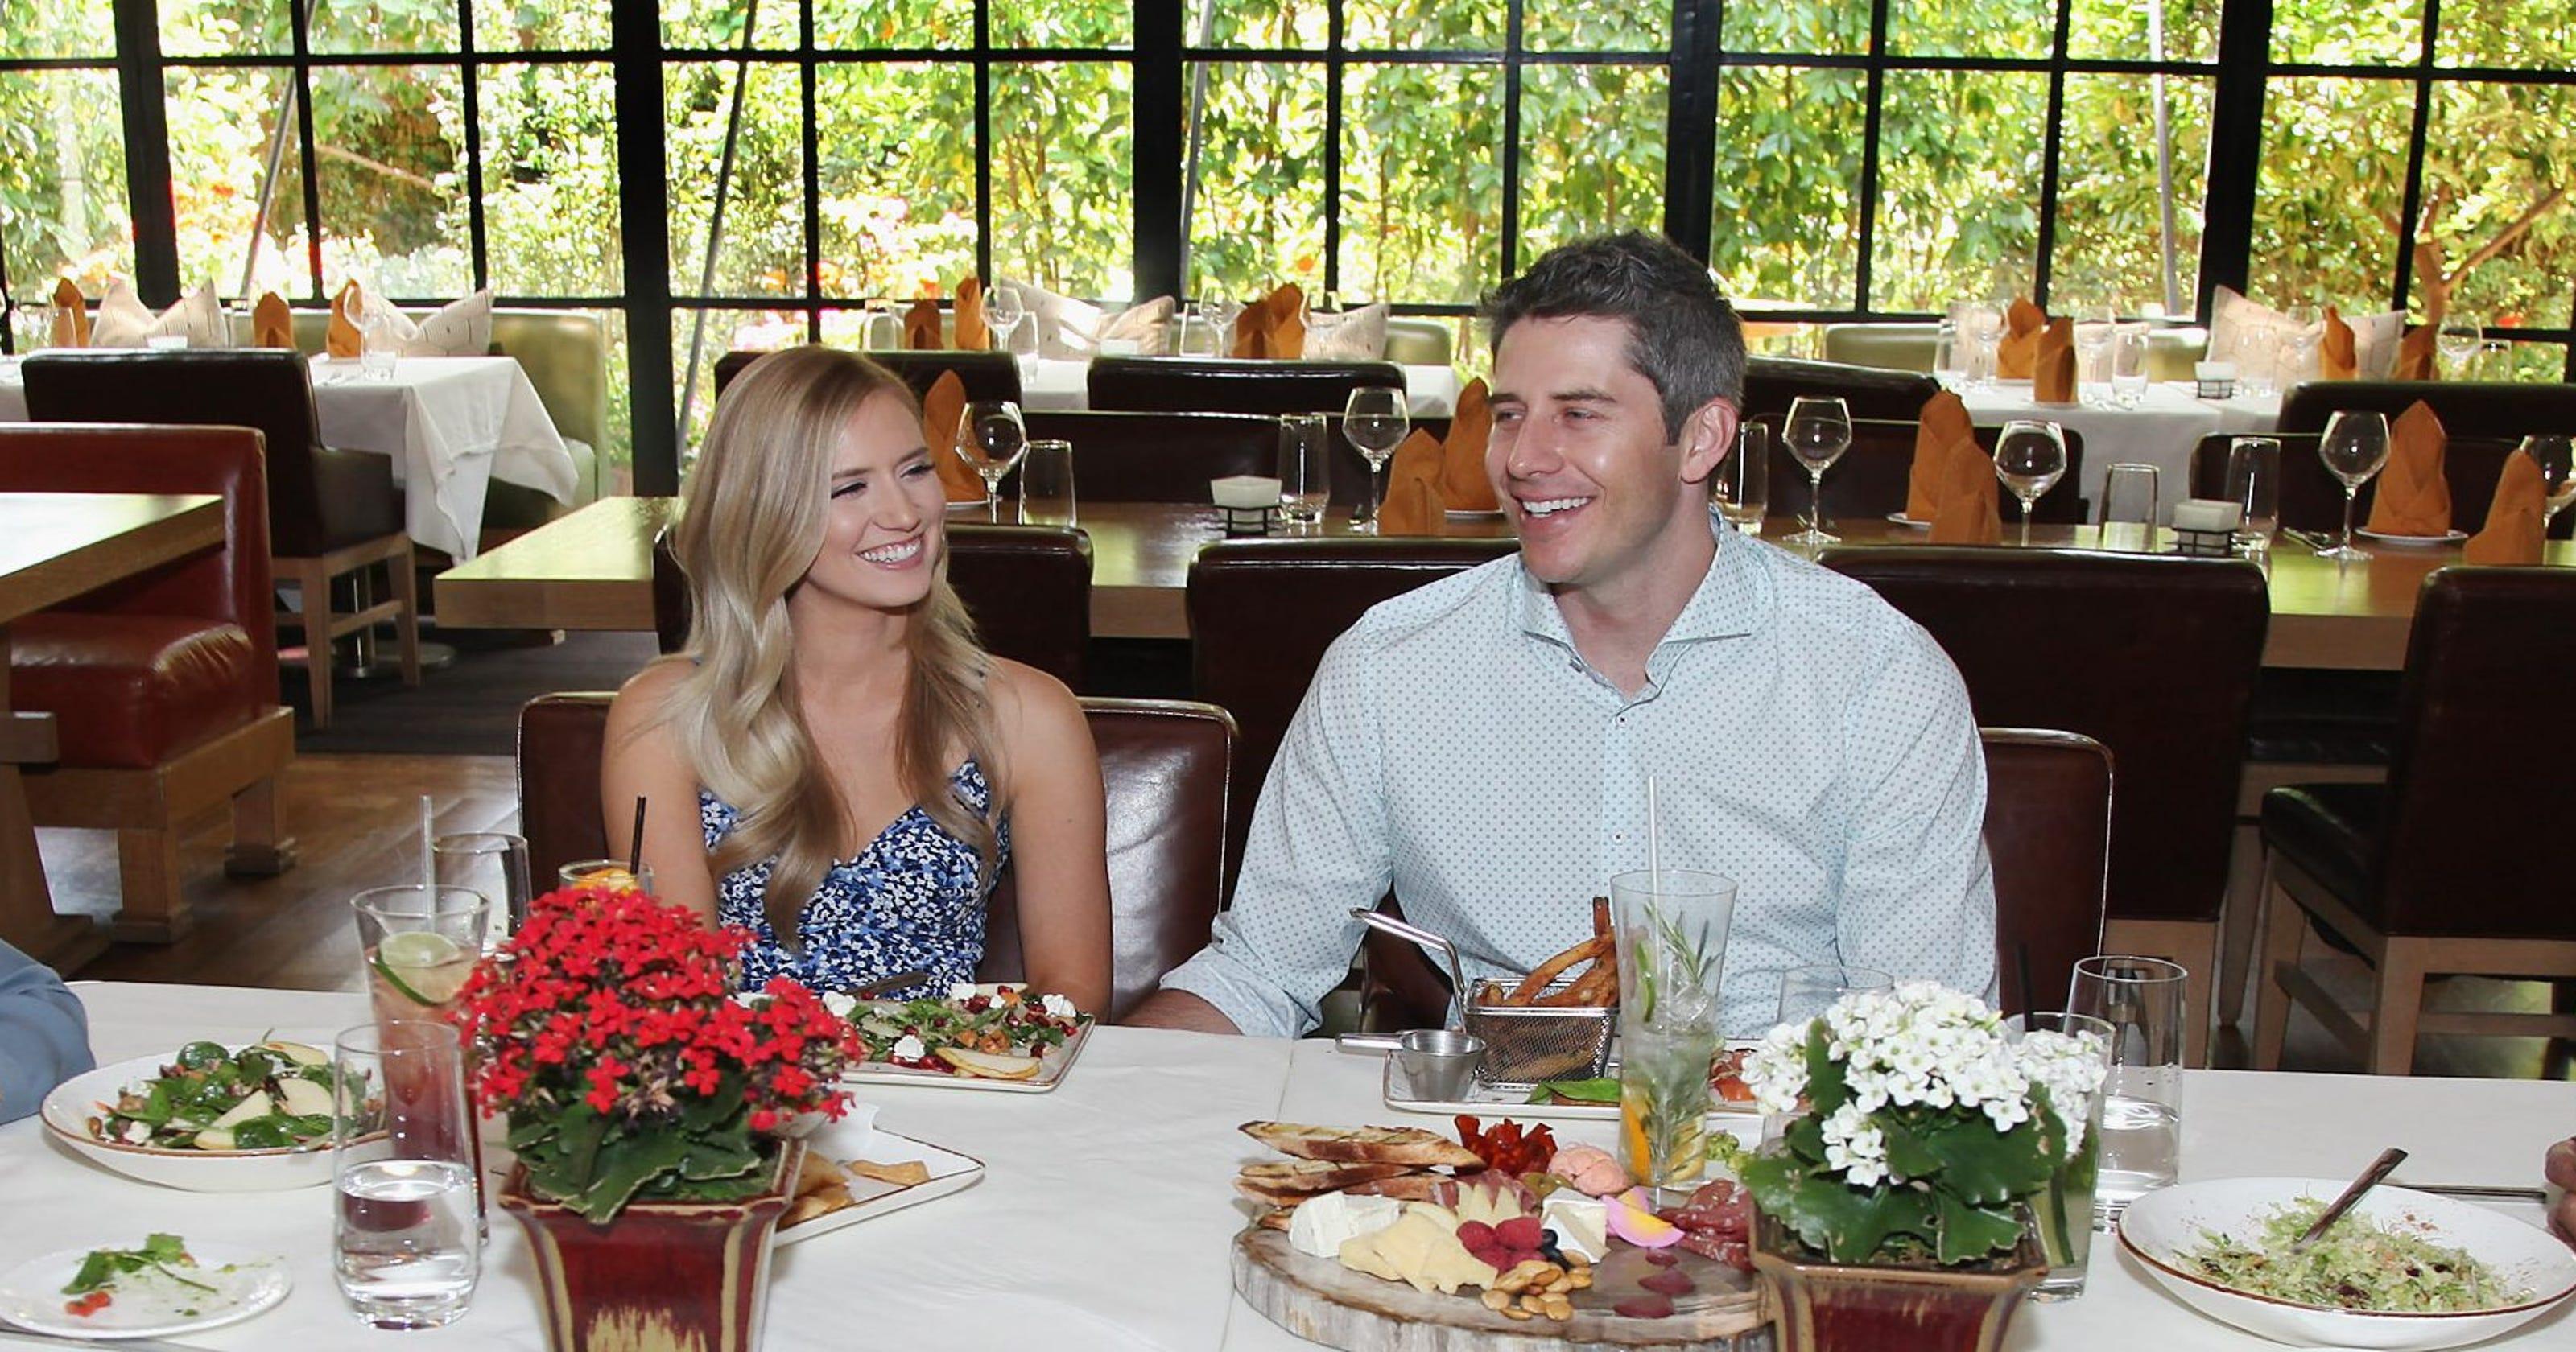 Bachelor Arie Luyendyk Jr Expecting First Child With Lauren Burnham